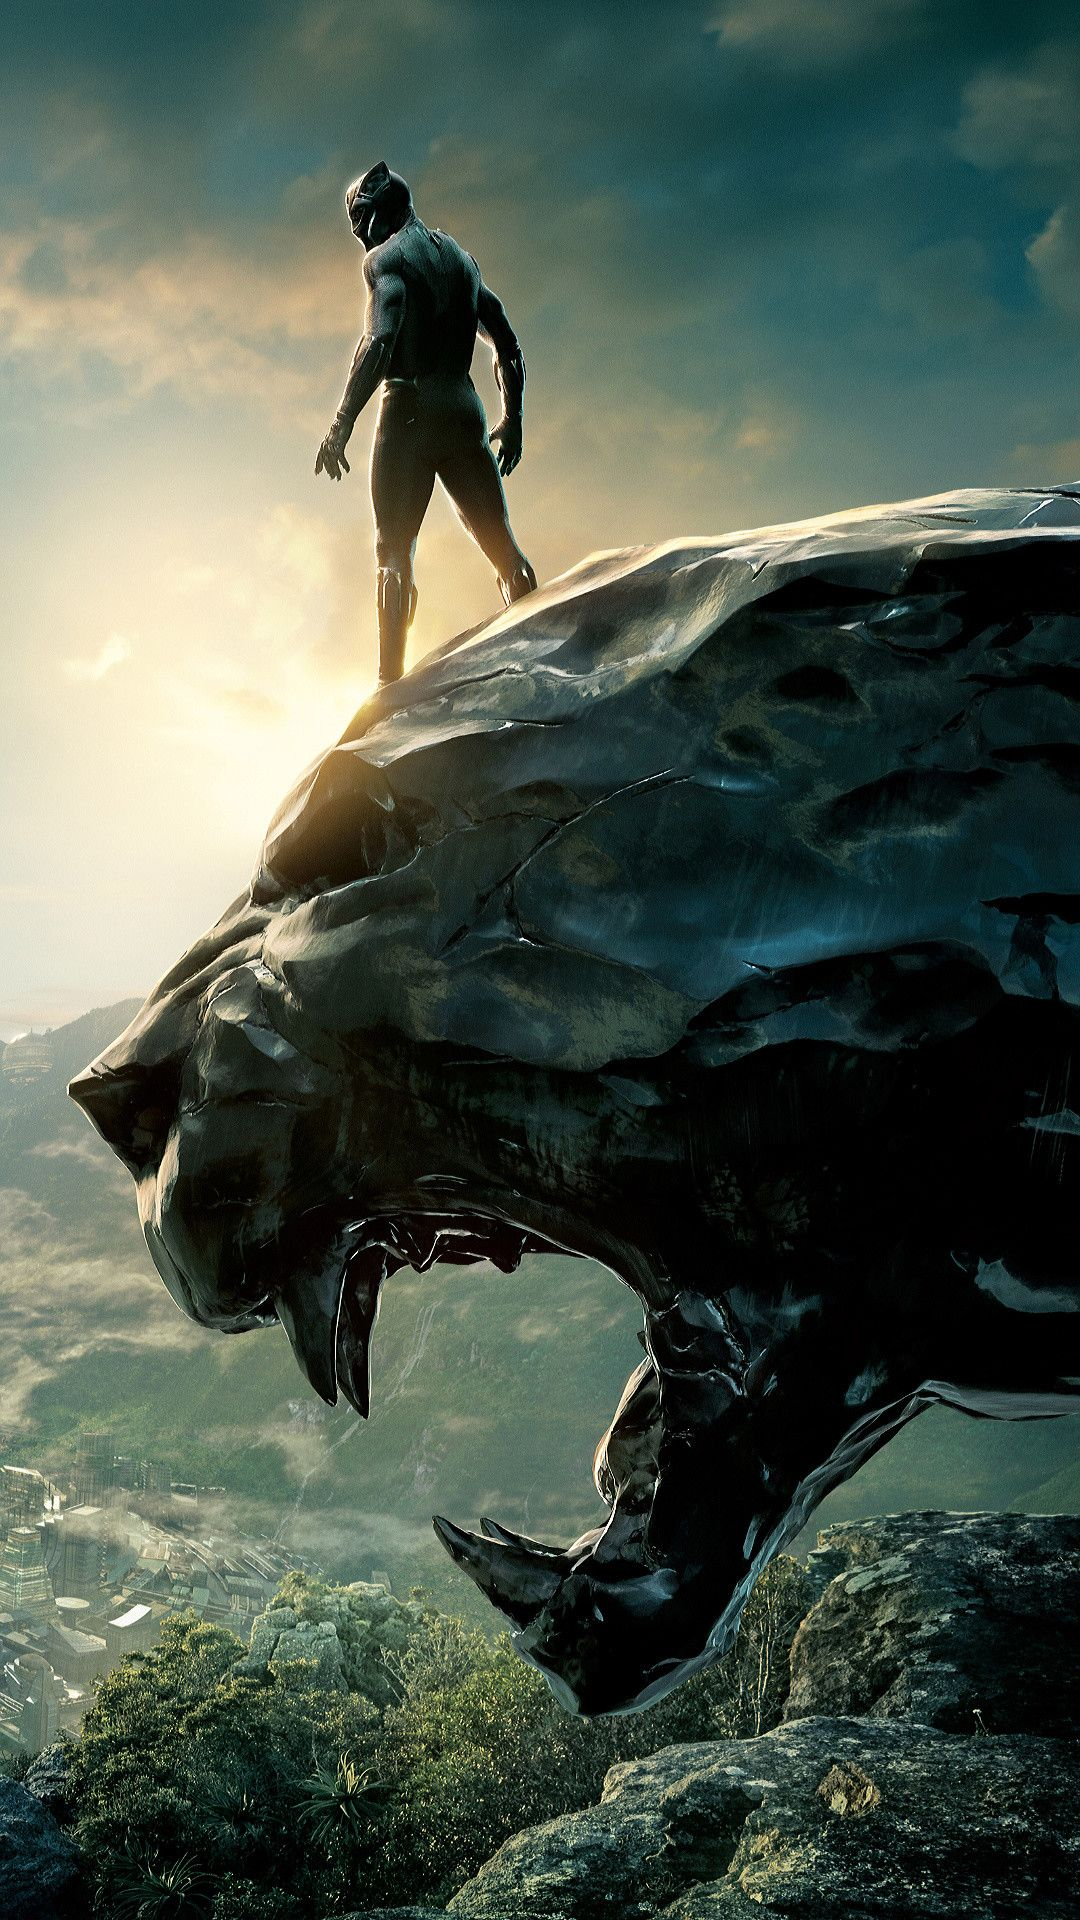 Black Panther Black Panther Marvel Marvel Wallpaper Dc Comics Wallpaper